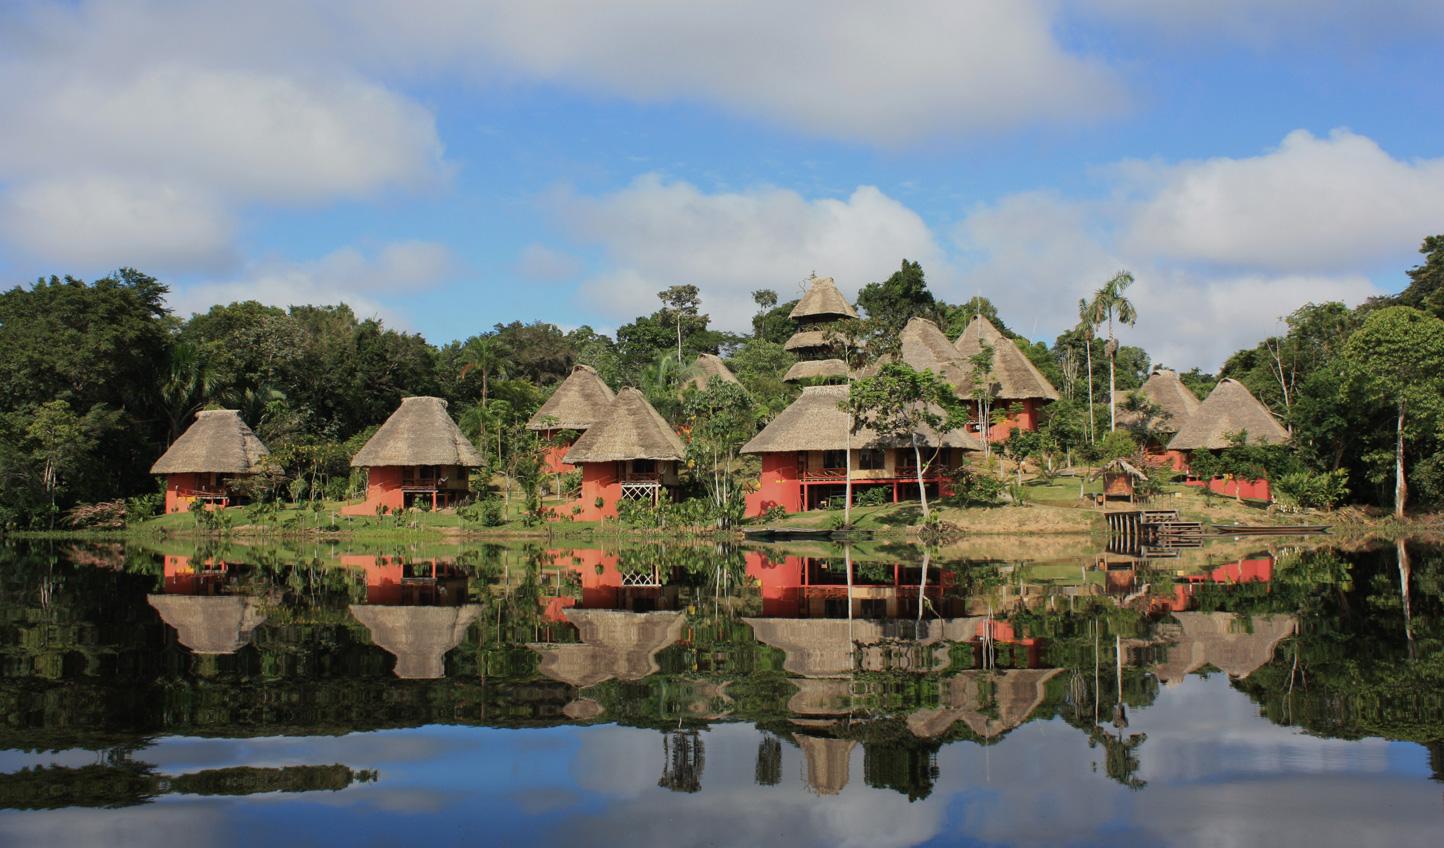 Idyllic setting on Lake Añangu